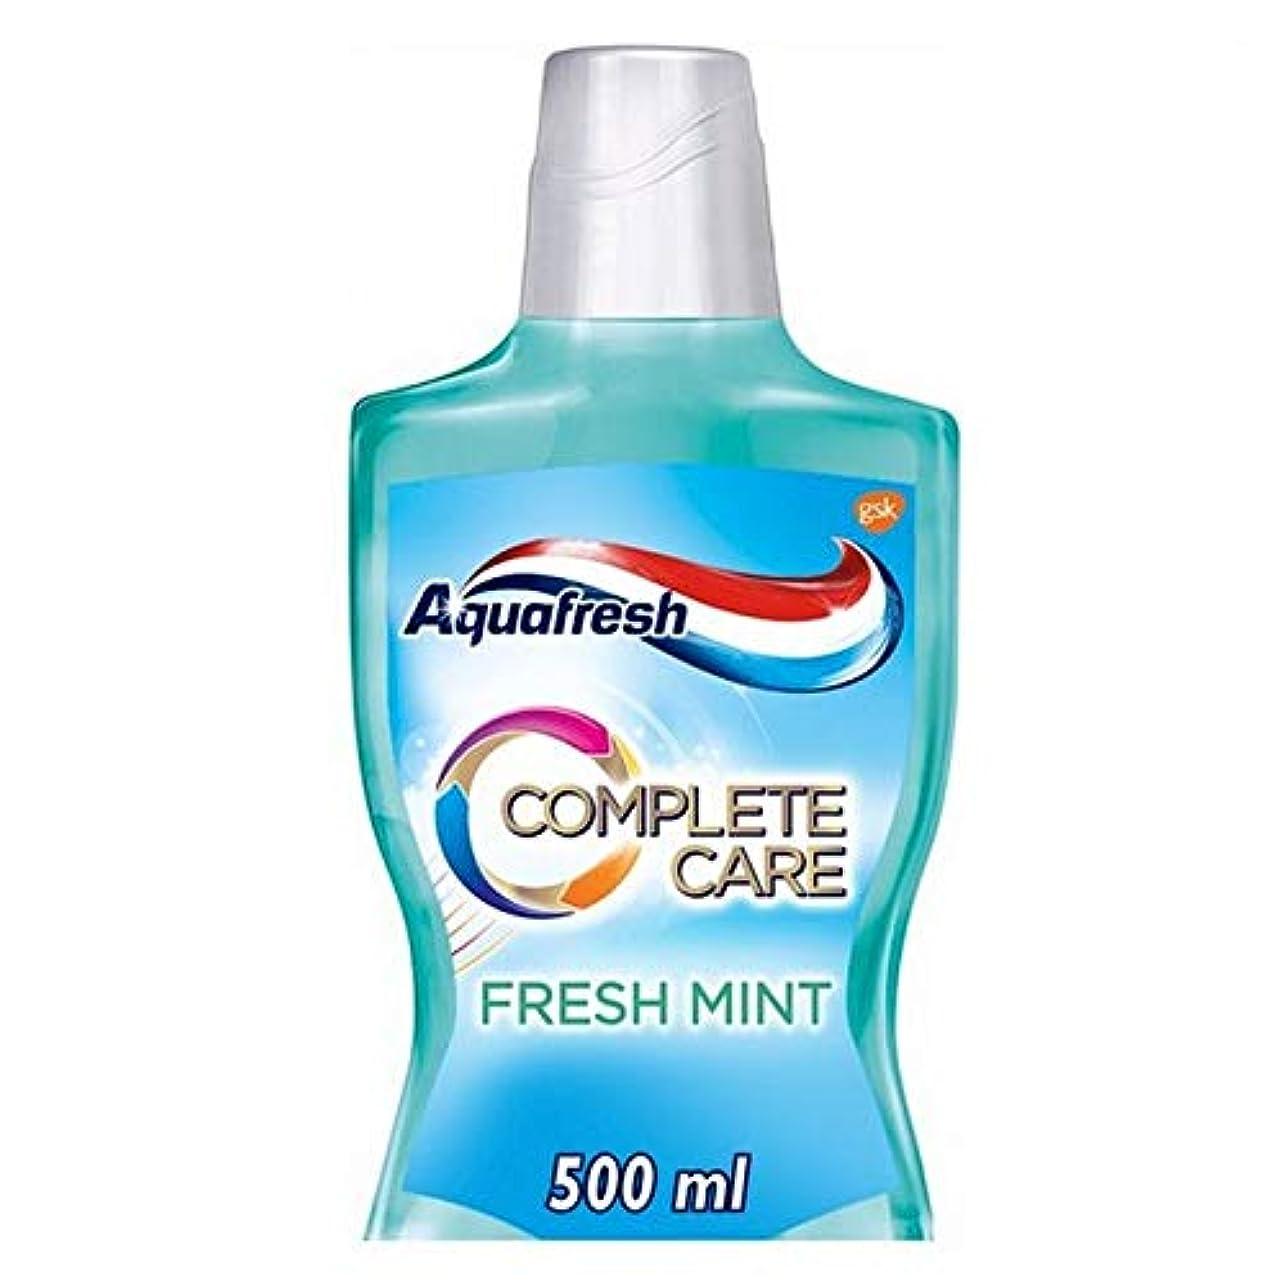 [Aquafresh ] アクアフレッシュコンプリートケアマウスウォッシュ500ミリリットル - Aquafresh Complete Care Mouthwash 500ml [並行輸入品]